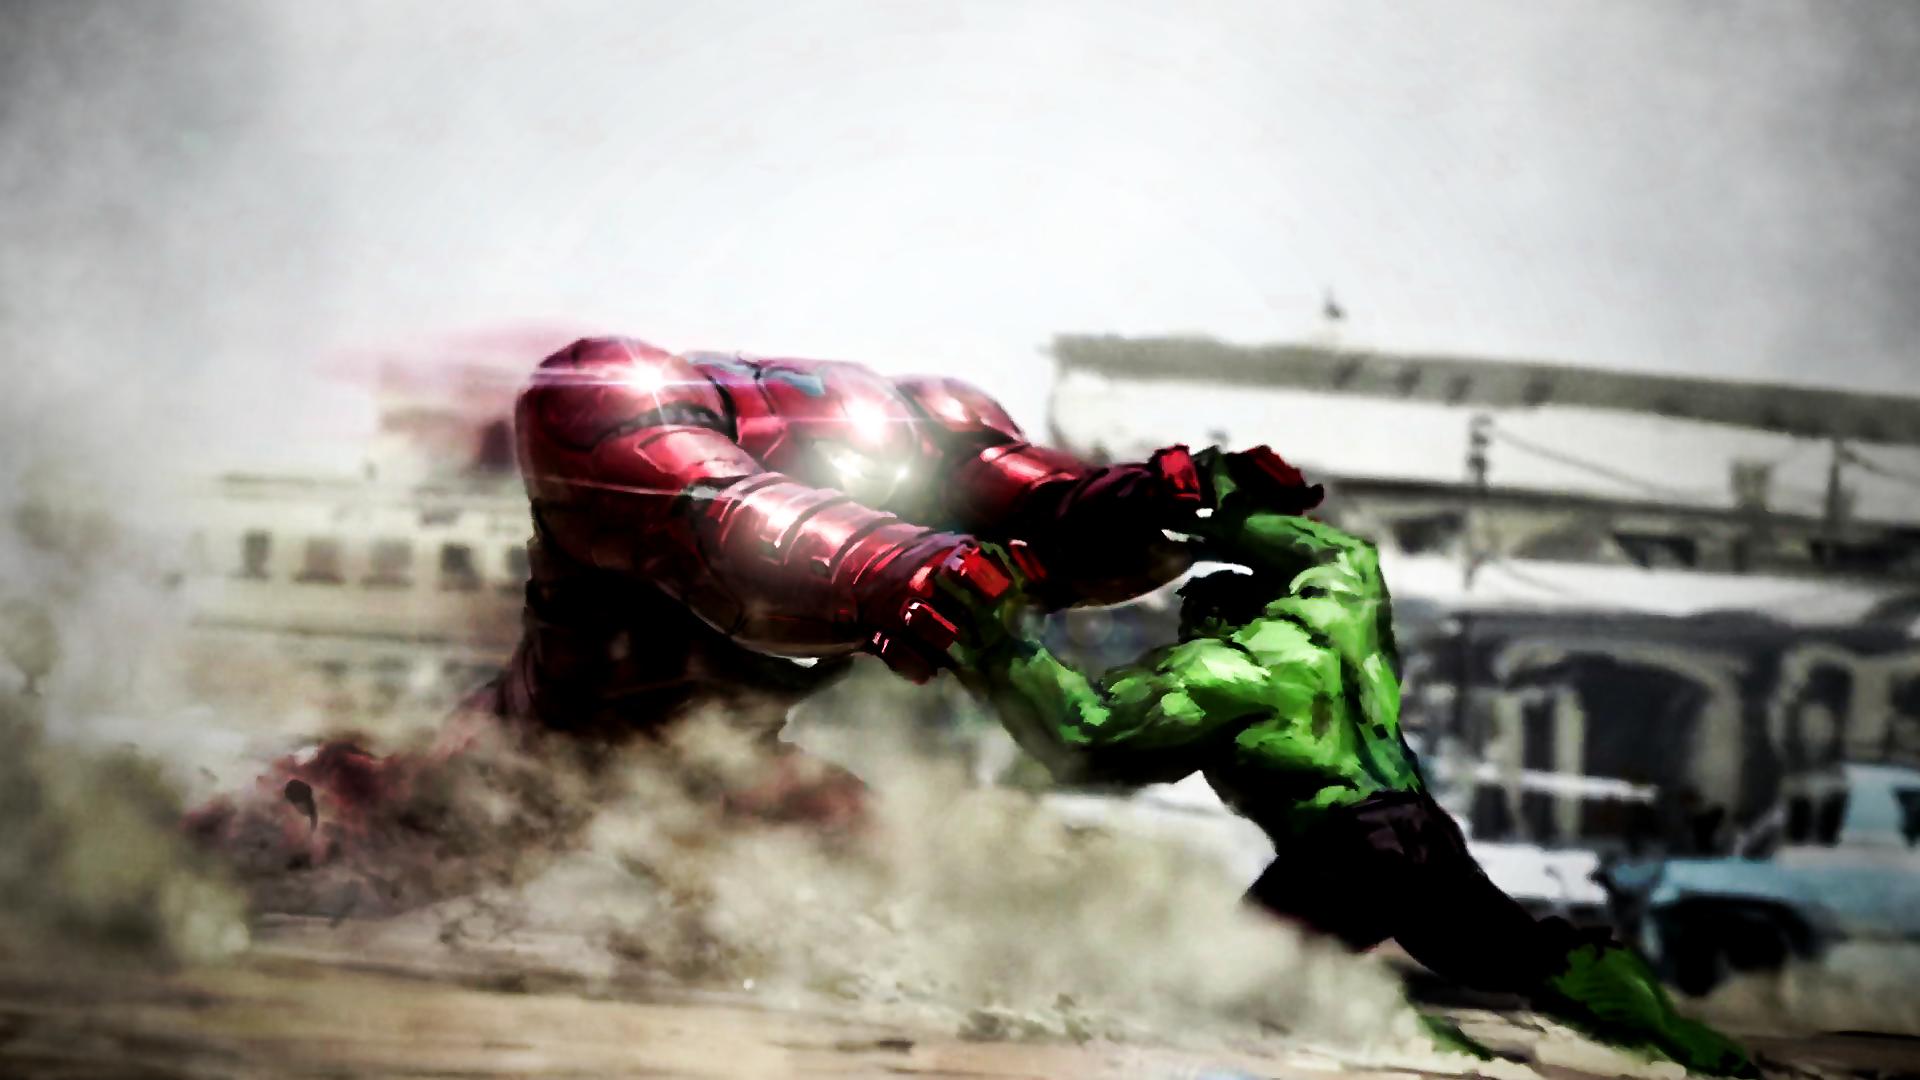 Железный человек Avengers  № 1390459 бесплатно